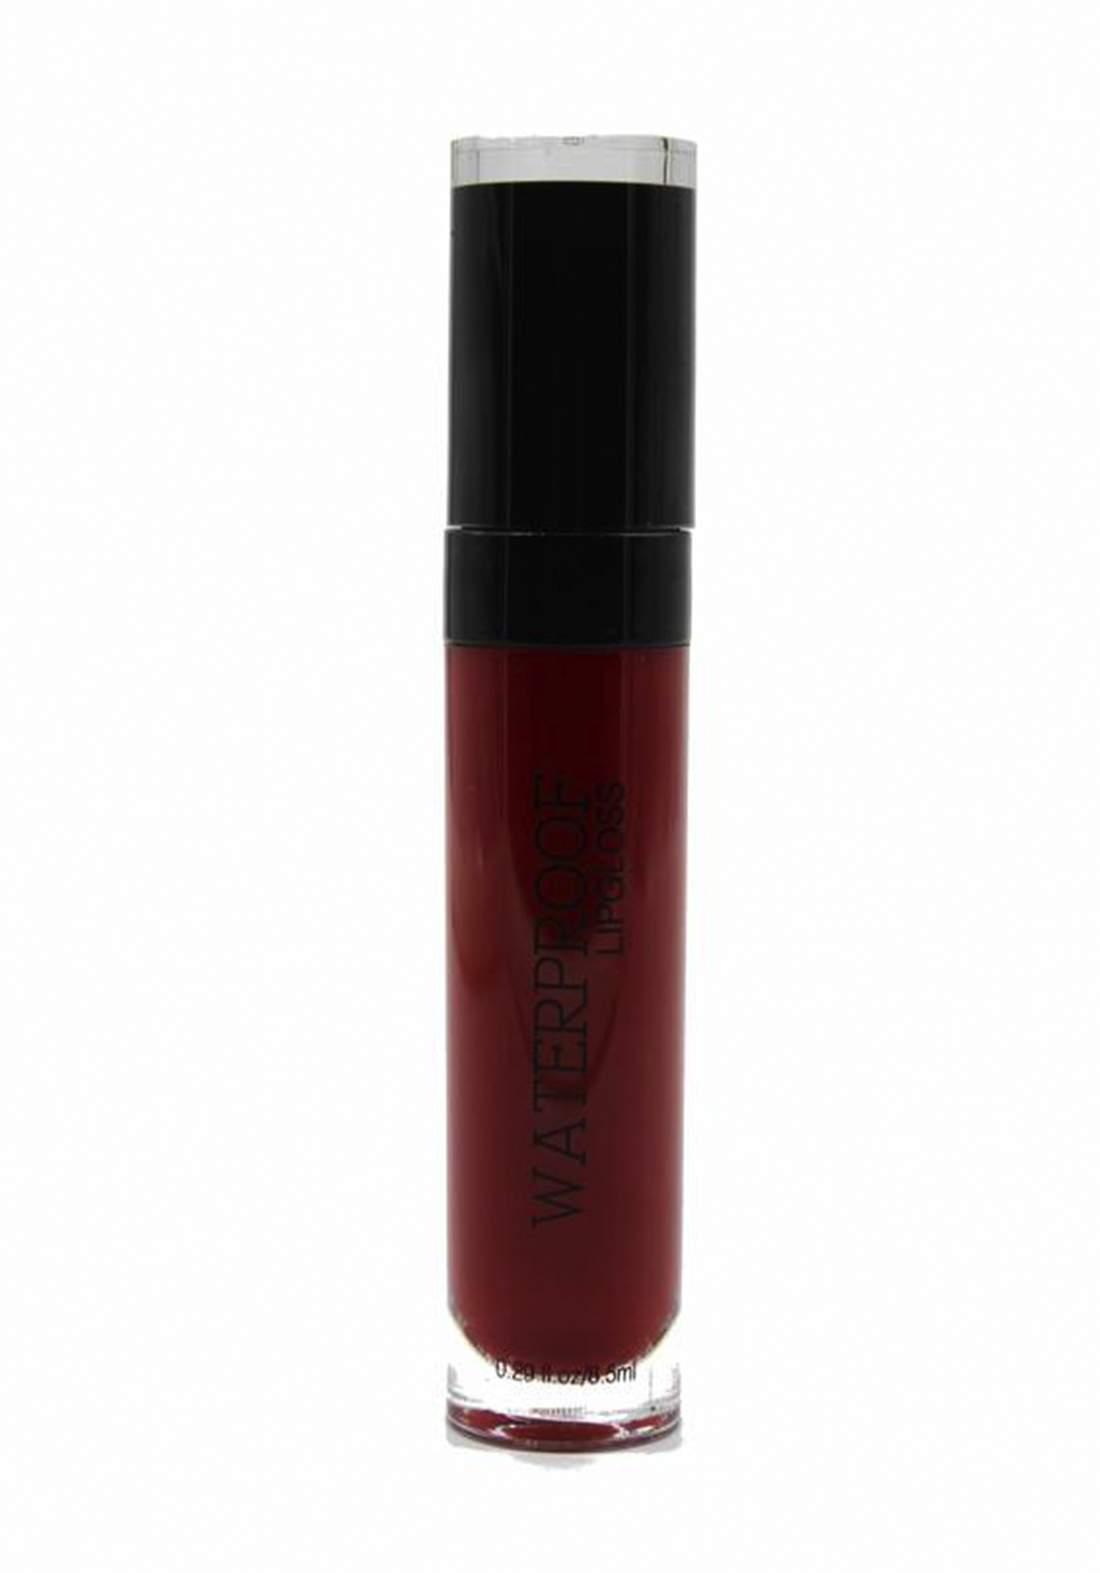 Queen Patra Waterproof lipgloss No.024 5ml احمر شفاه